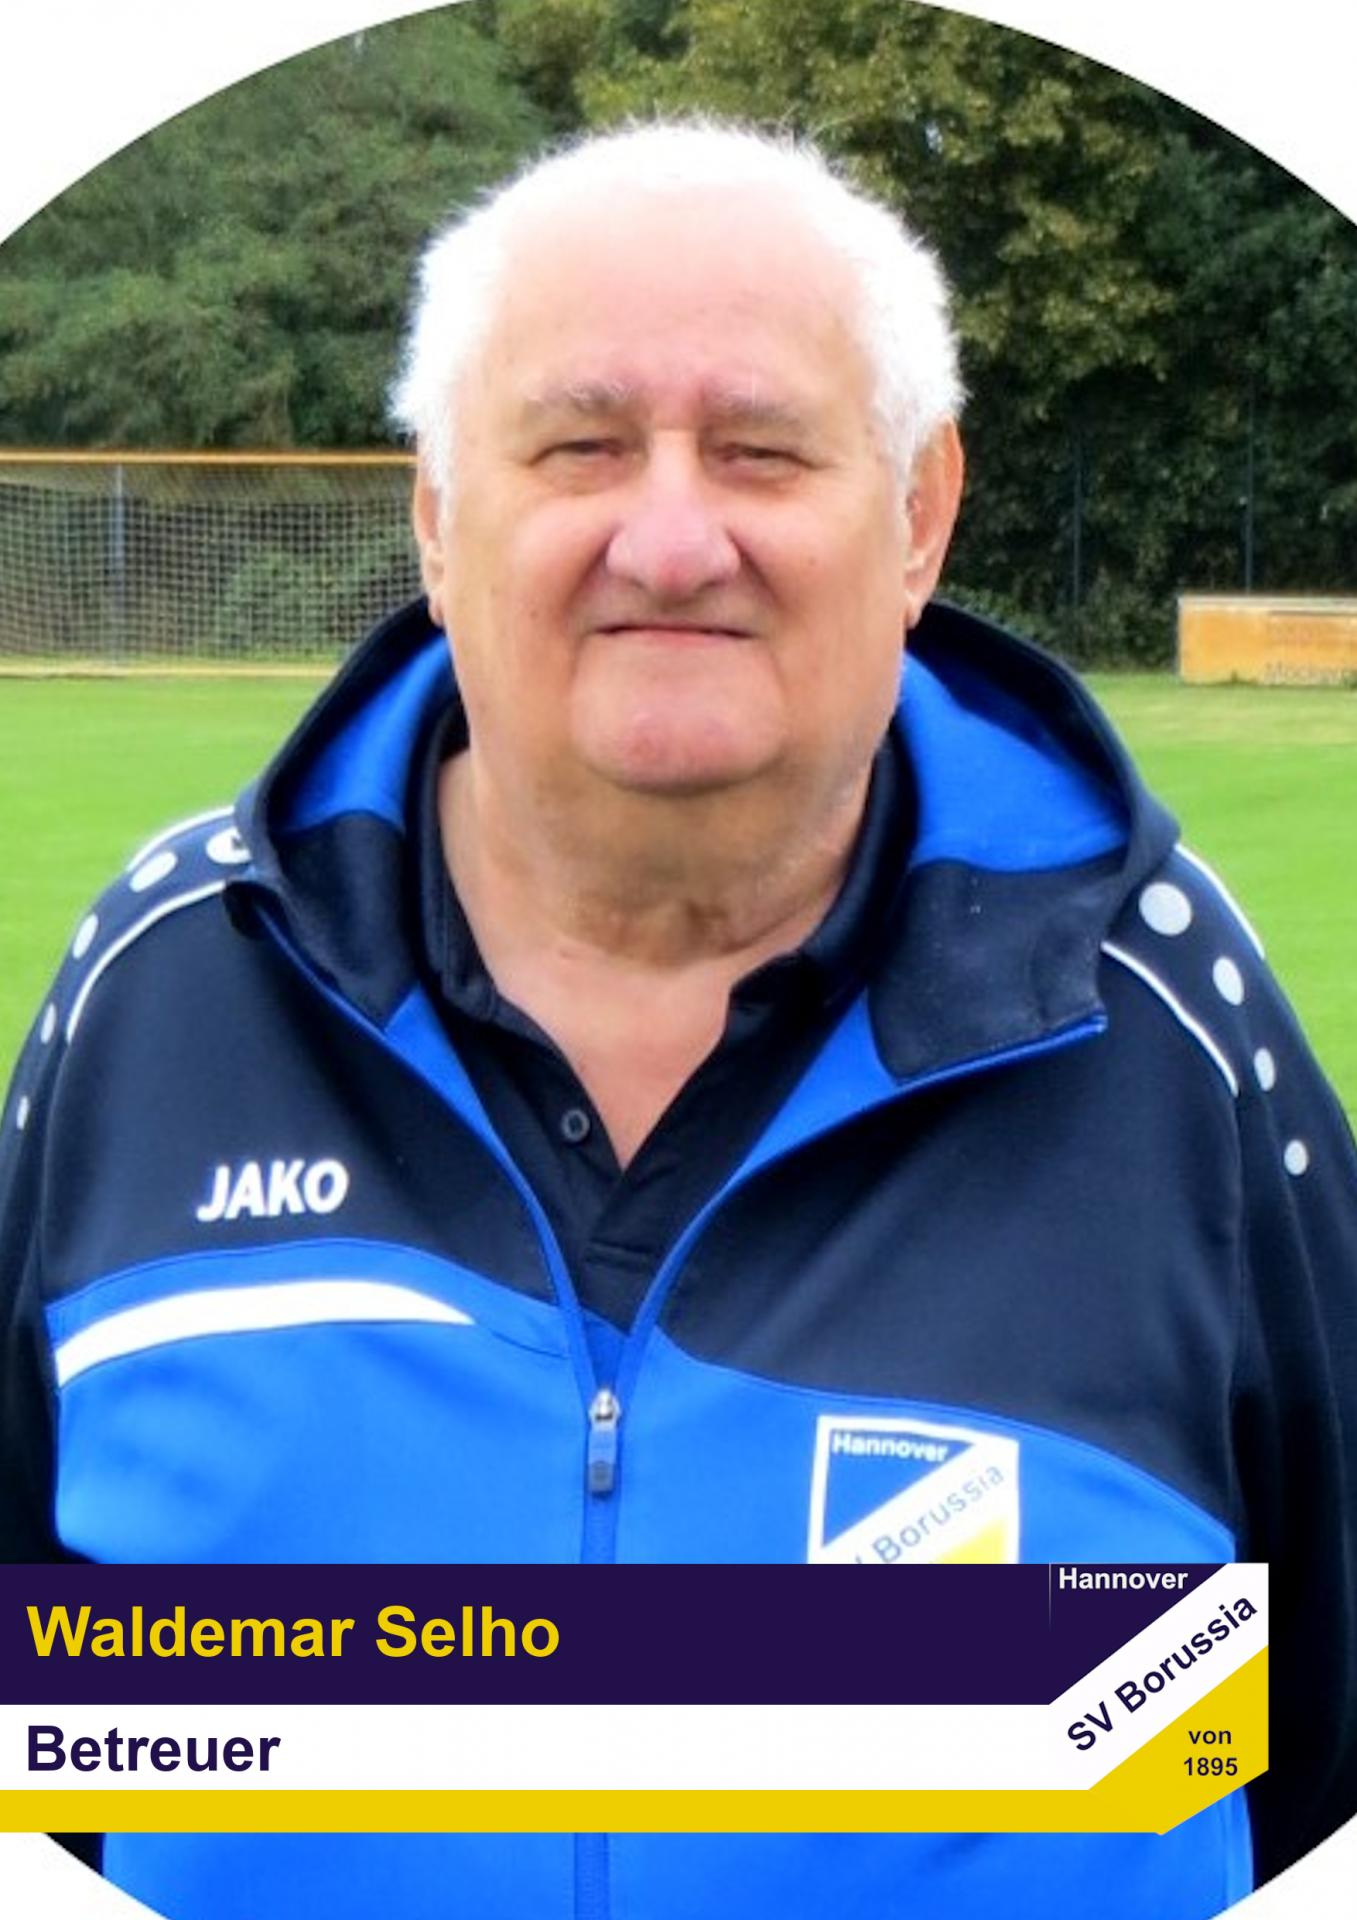 Waldemar Selho